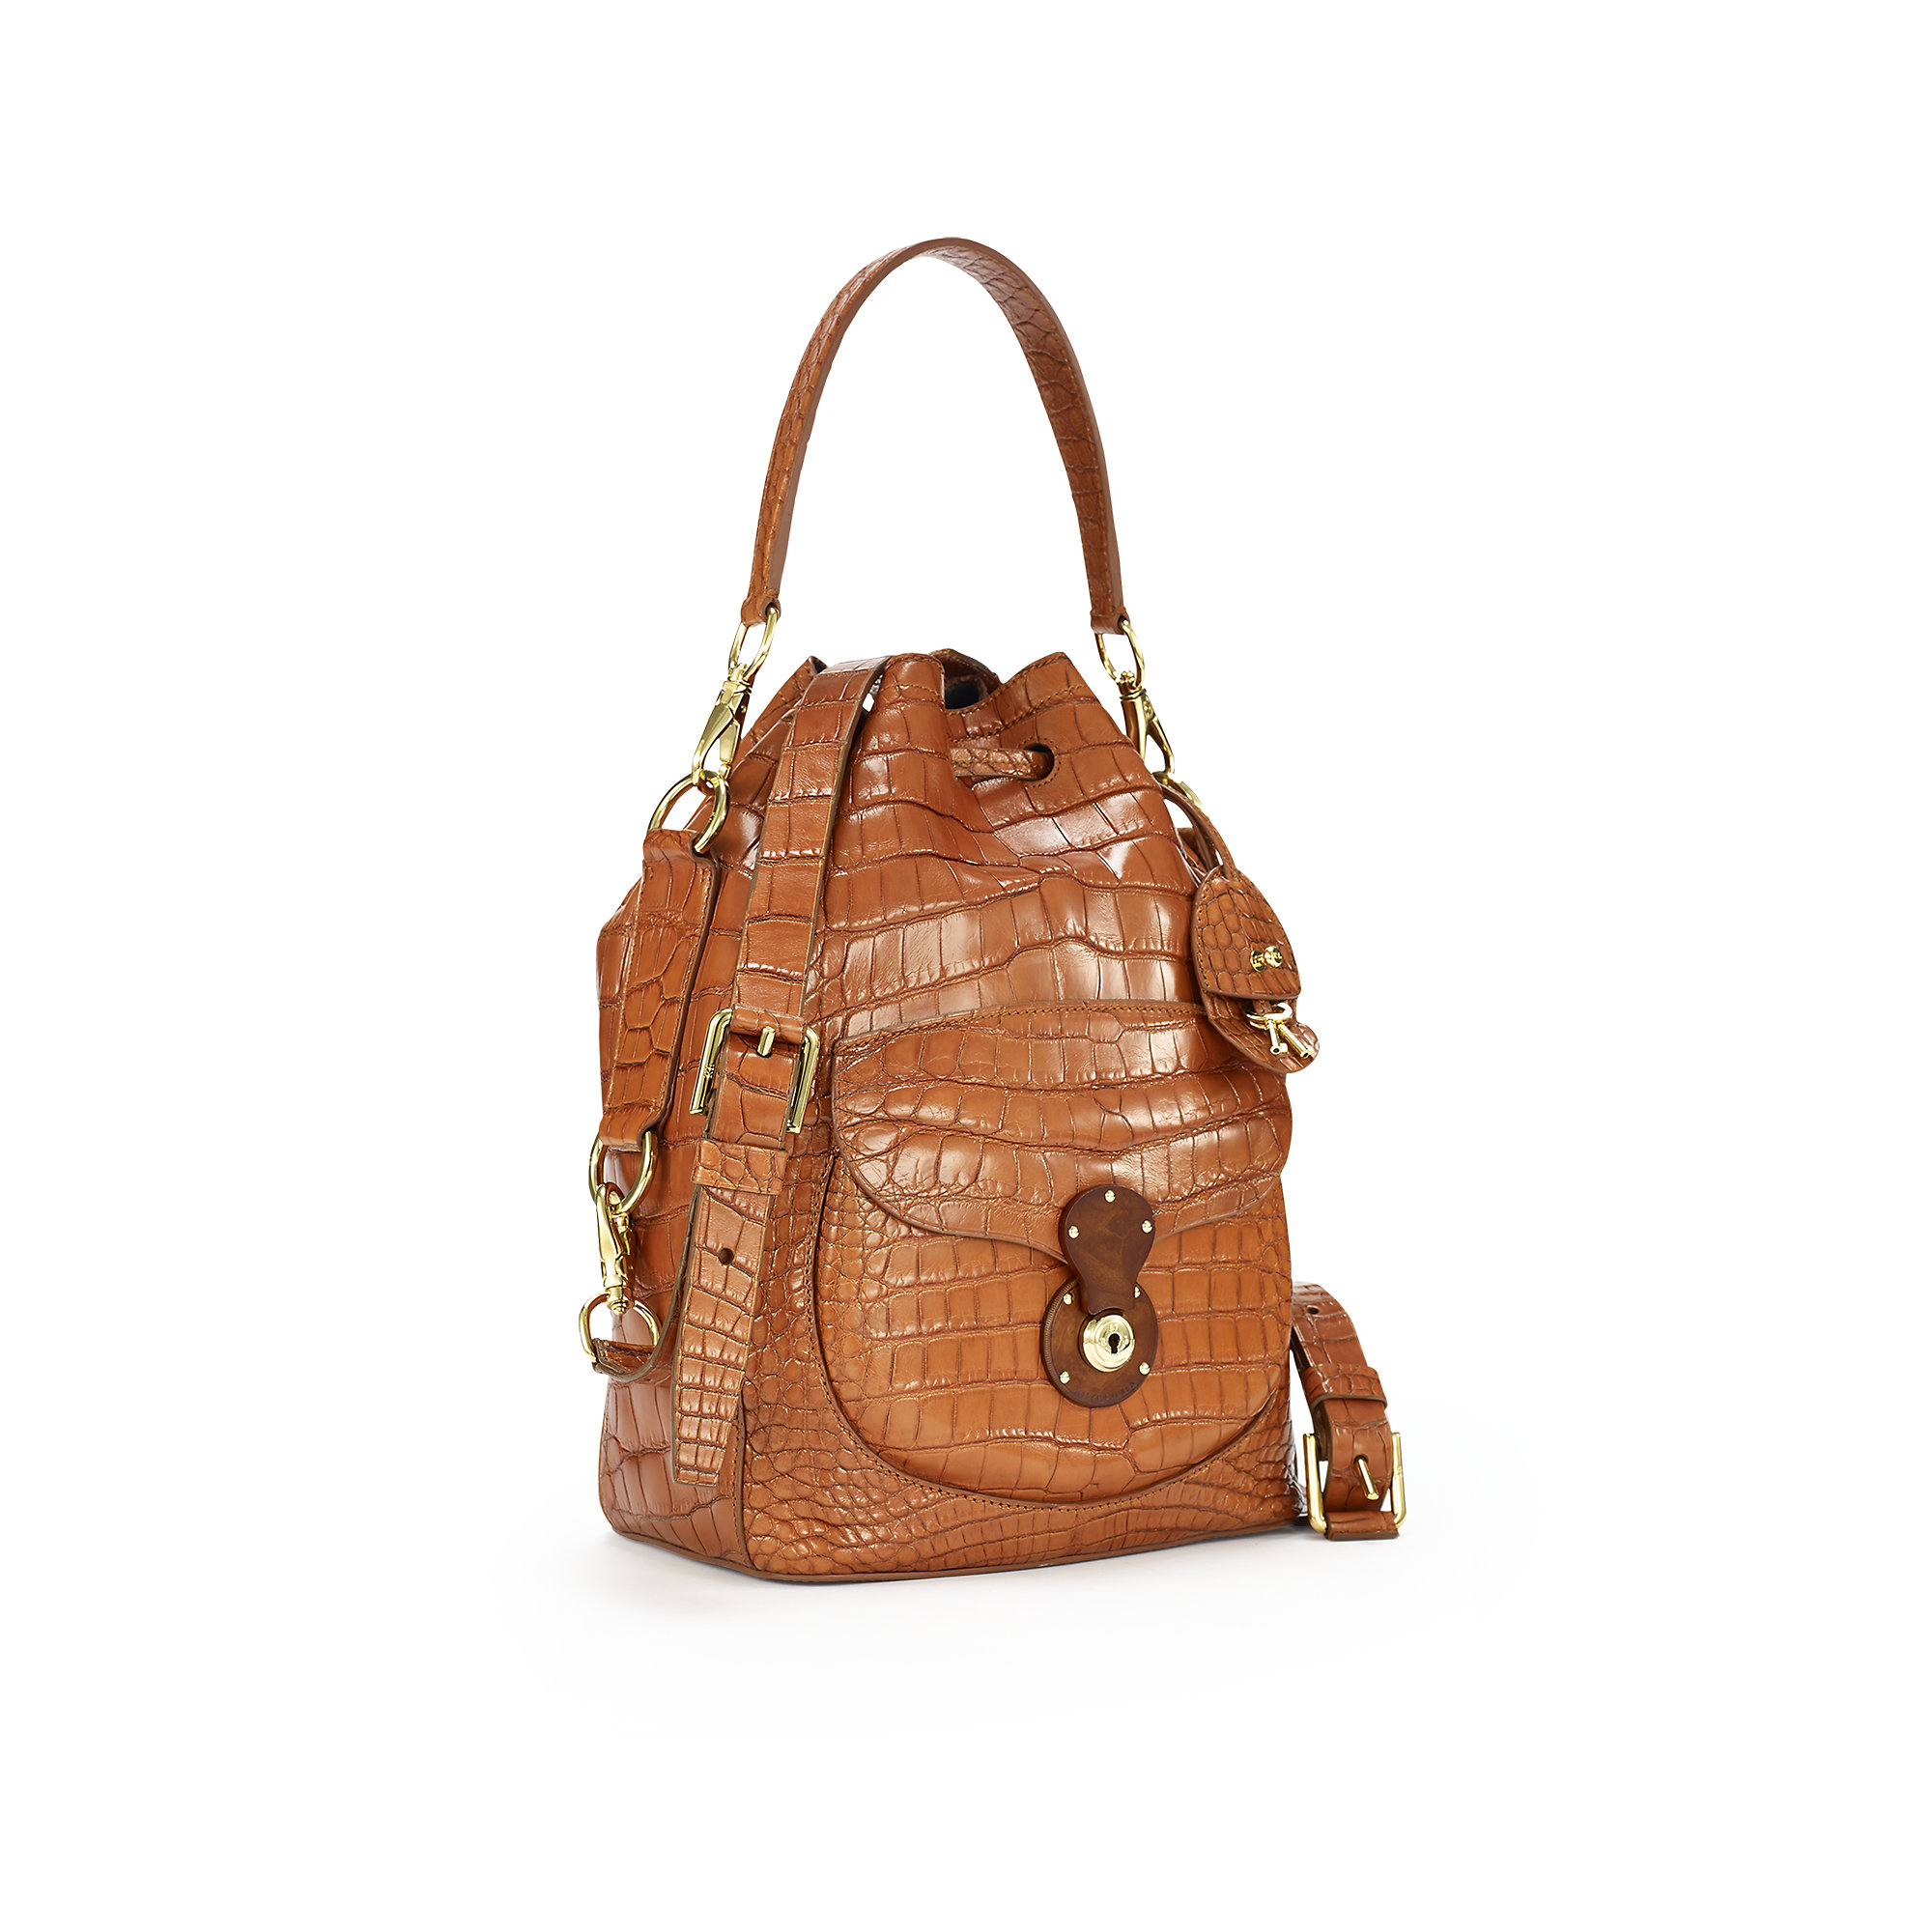 2be5352dba Lyst - Pink Pony Alligator Ricky Drawstring Bag in Brown